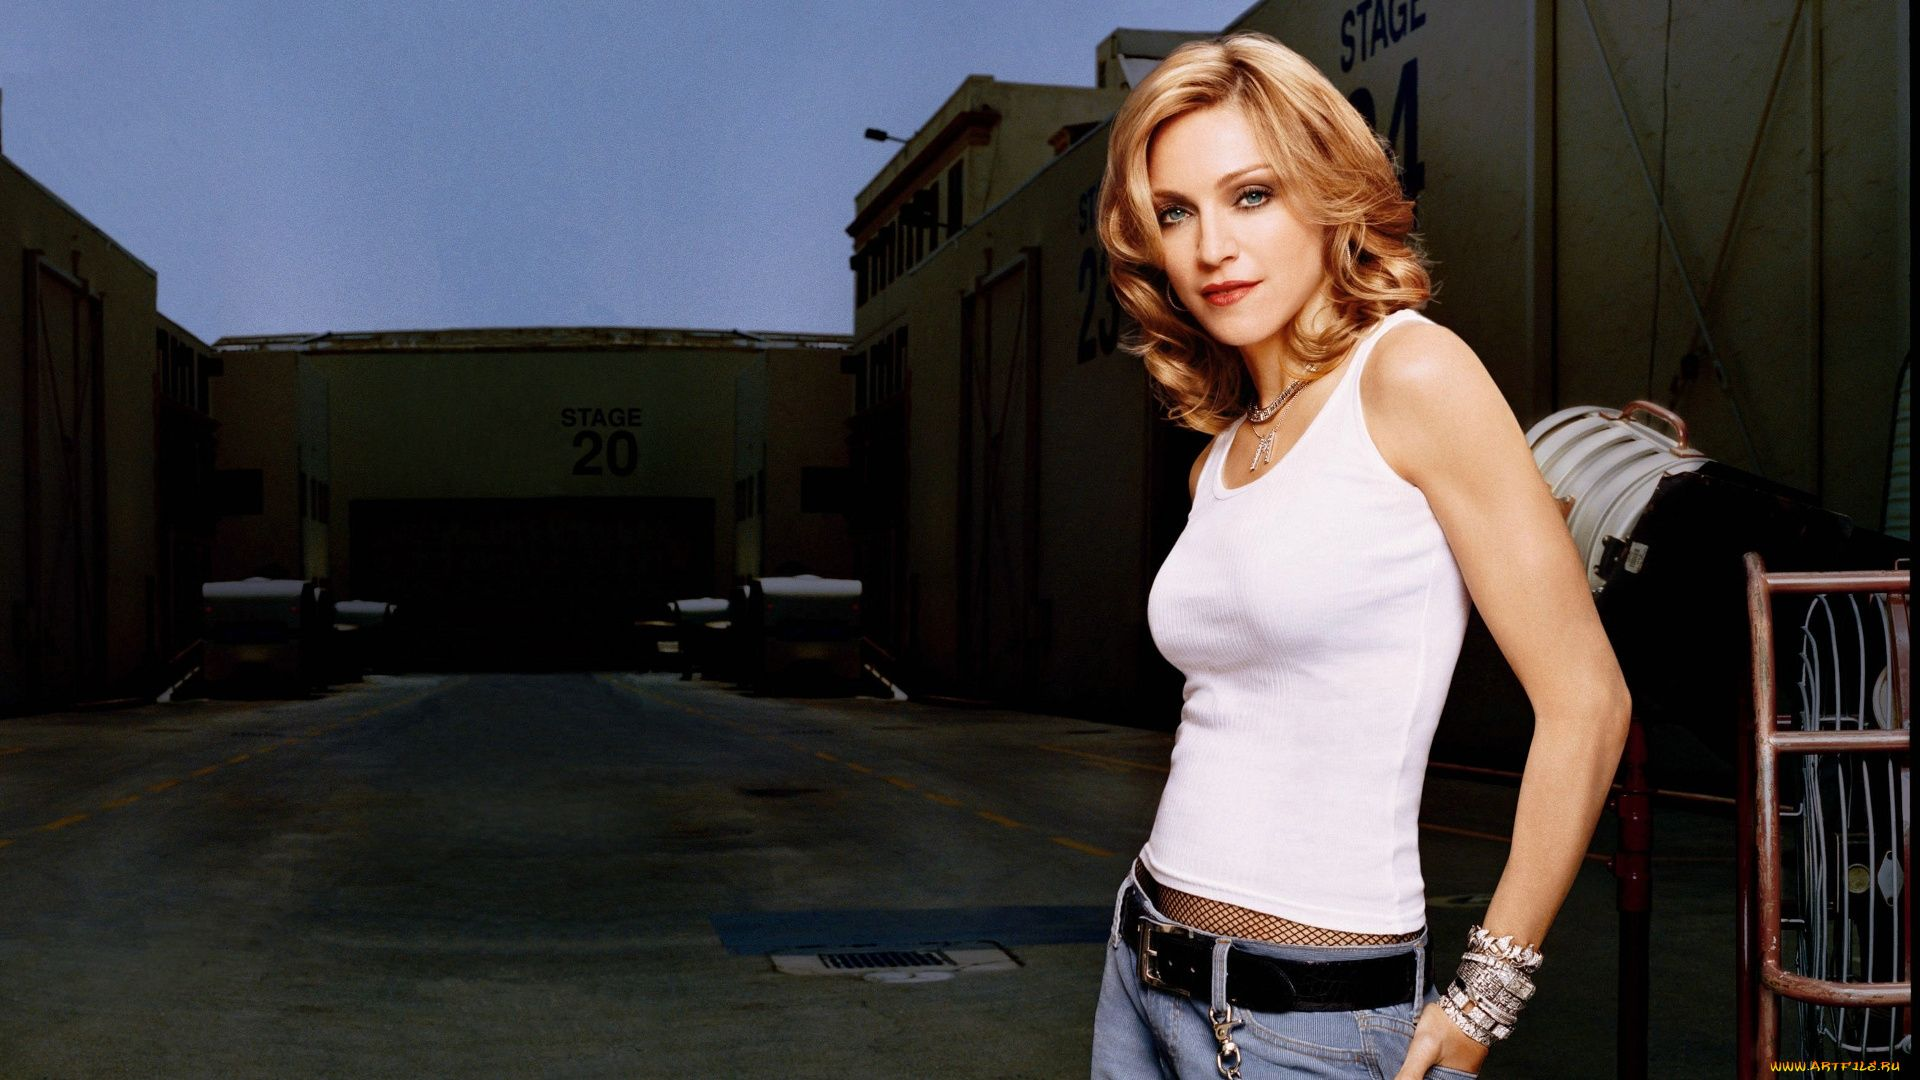 Madonna 1080p Wallpaper